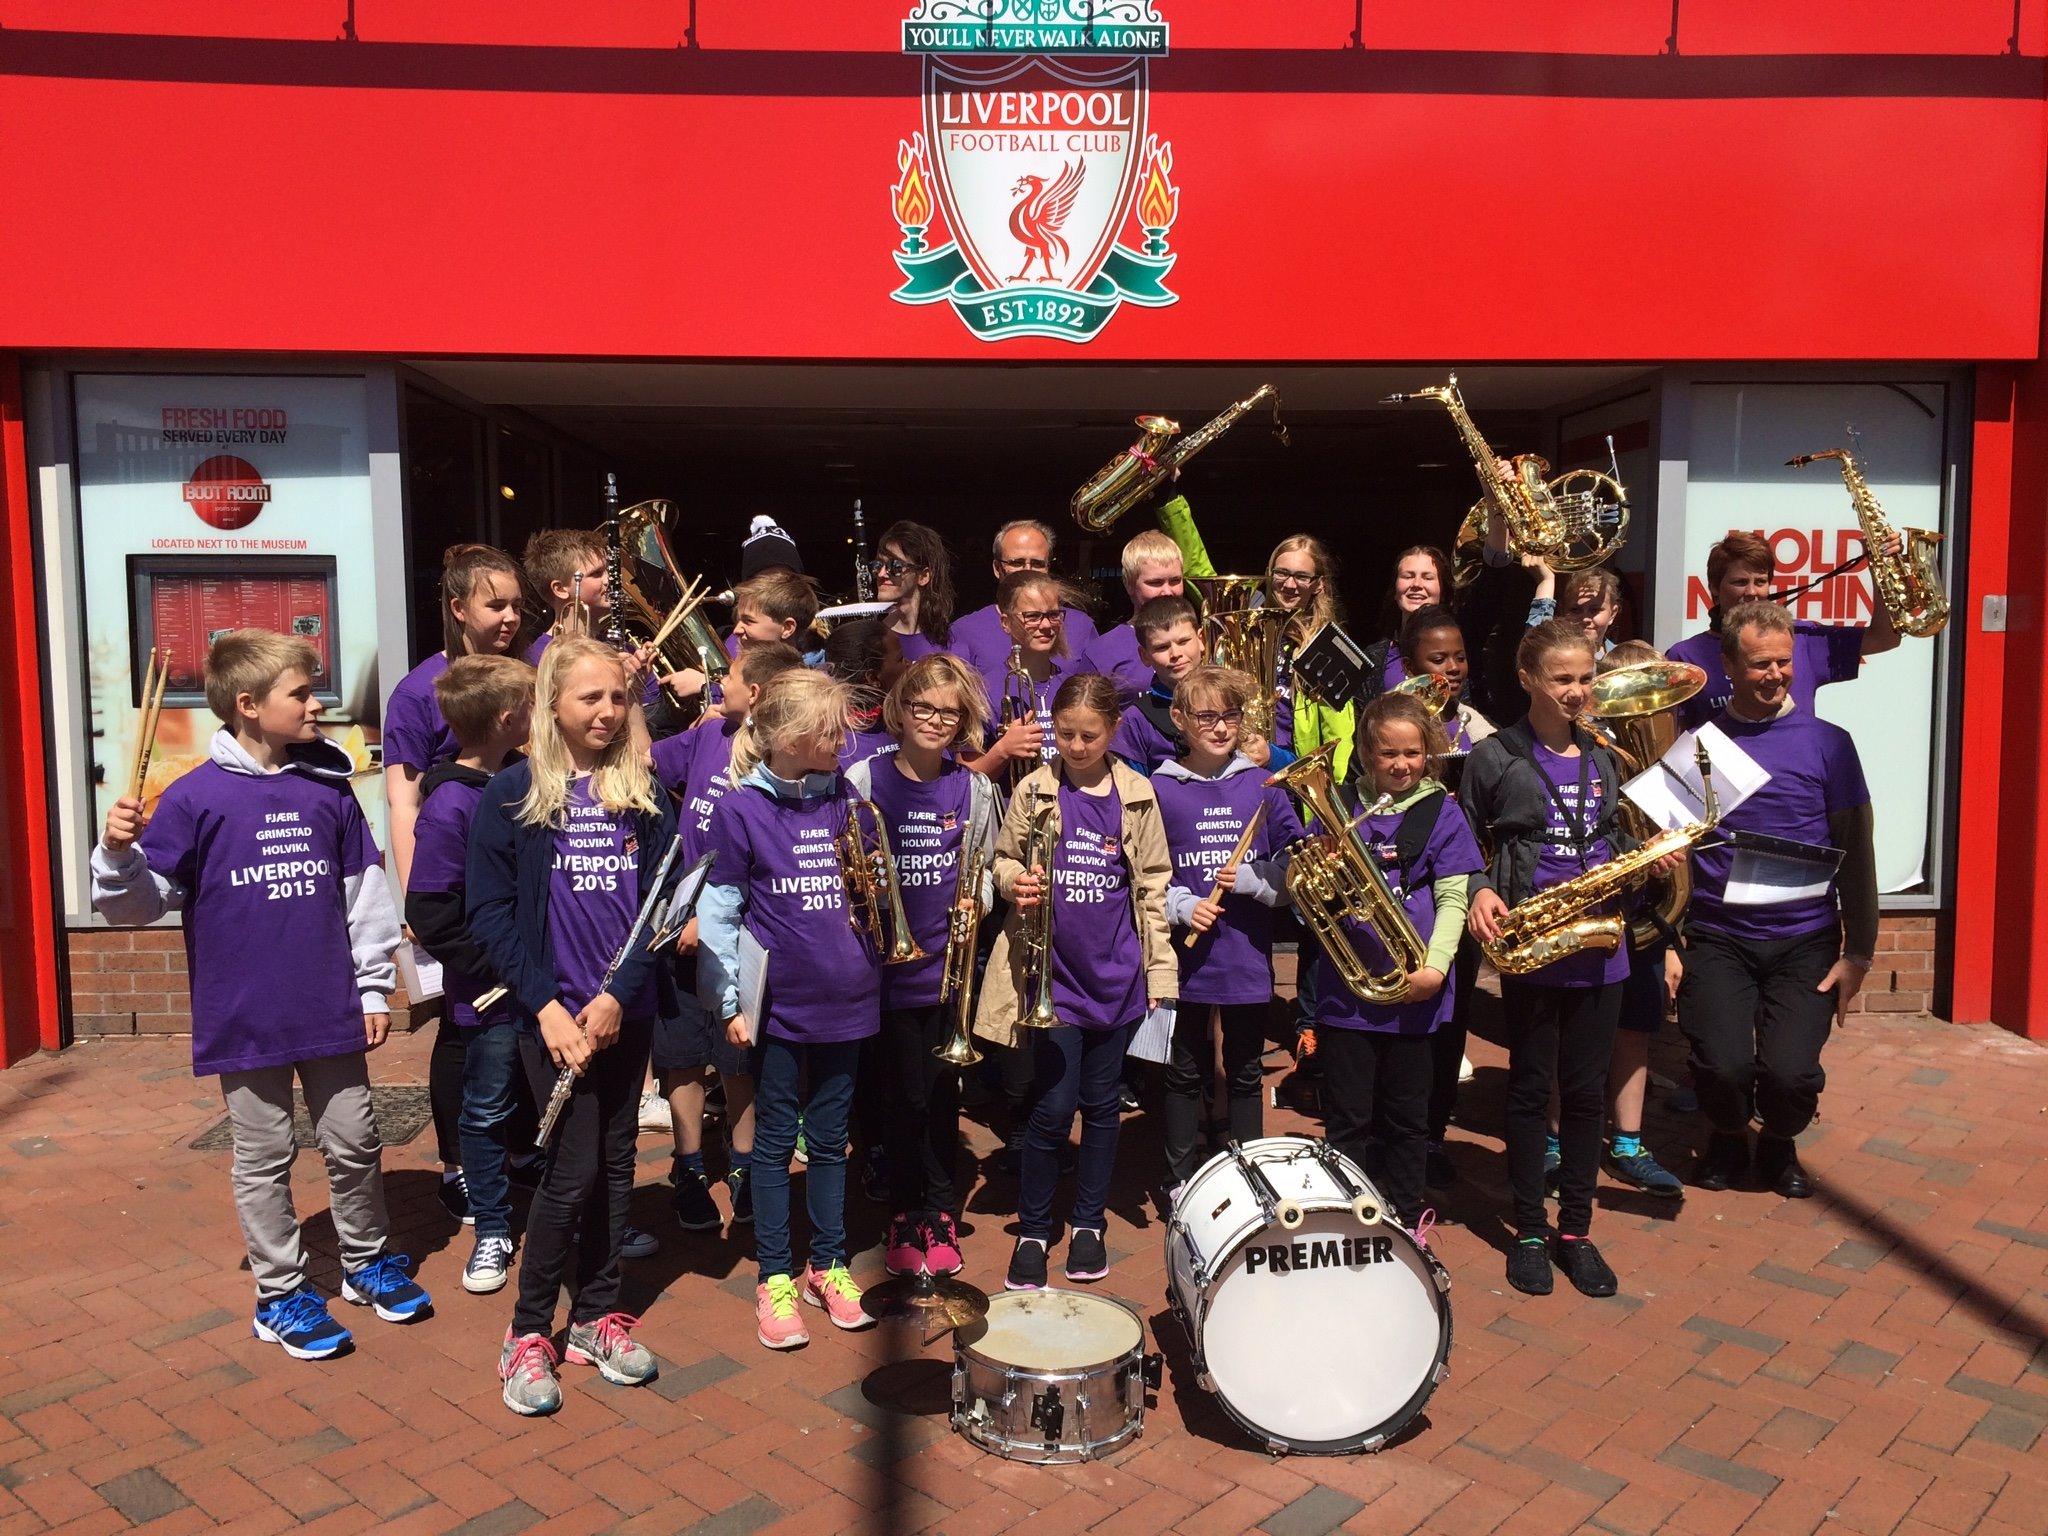 Korps Liverpool